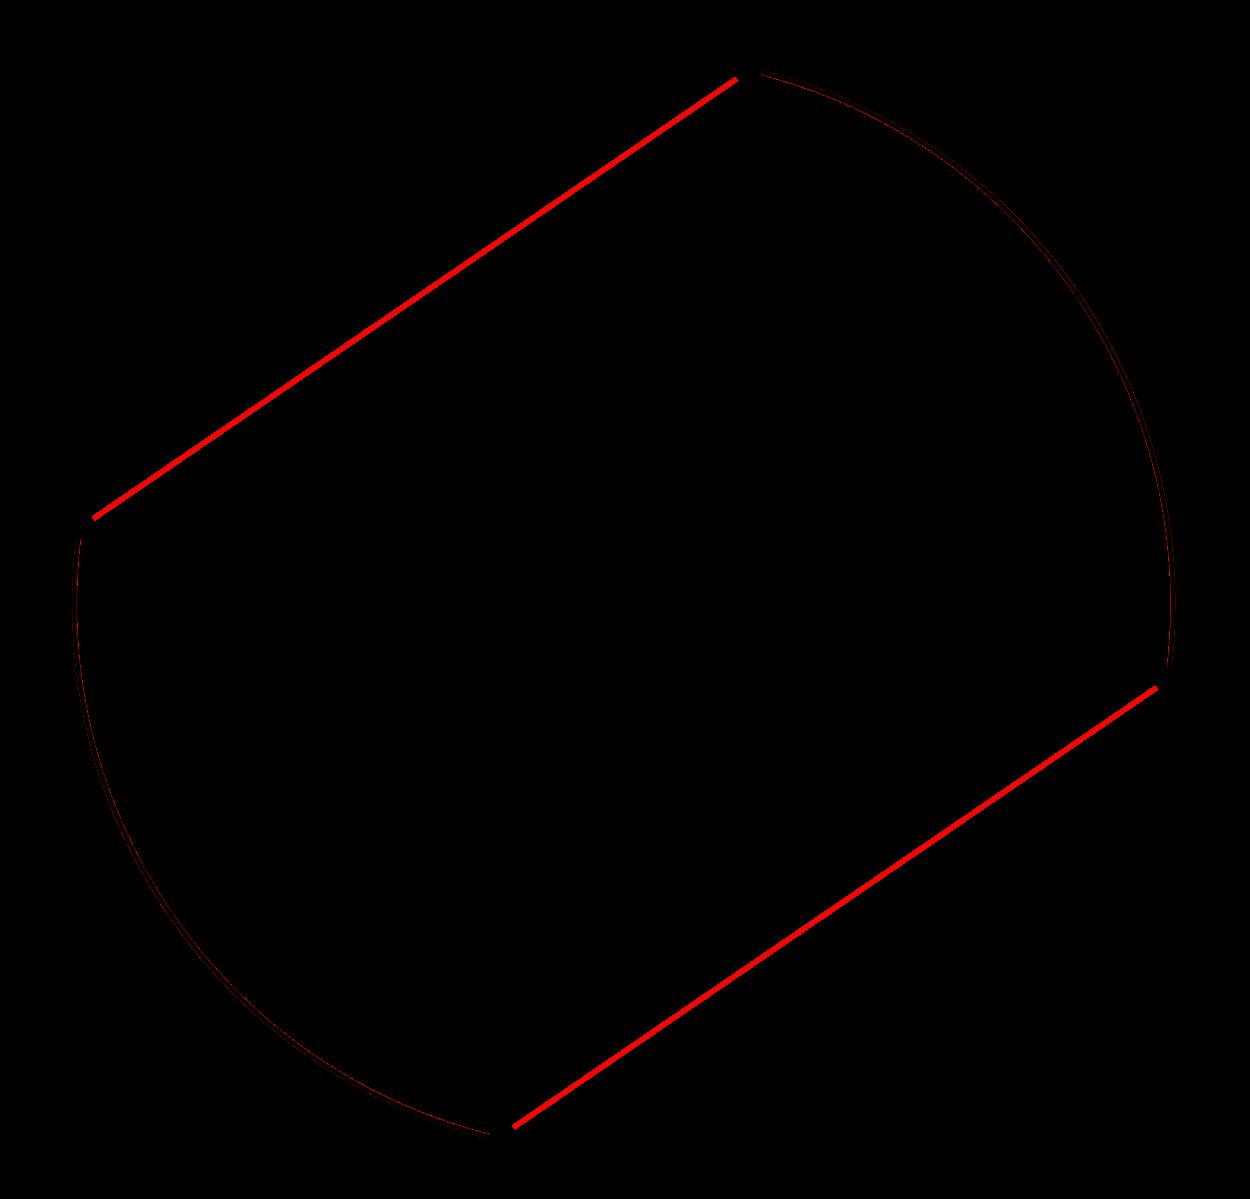 Хорда (геометрия)